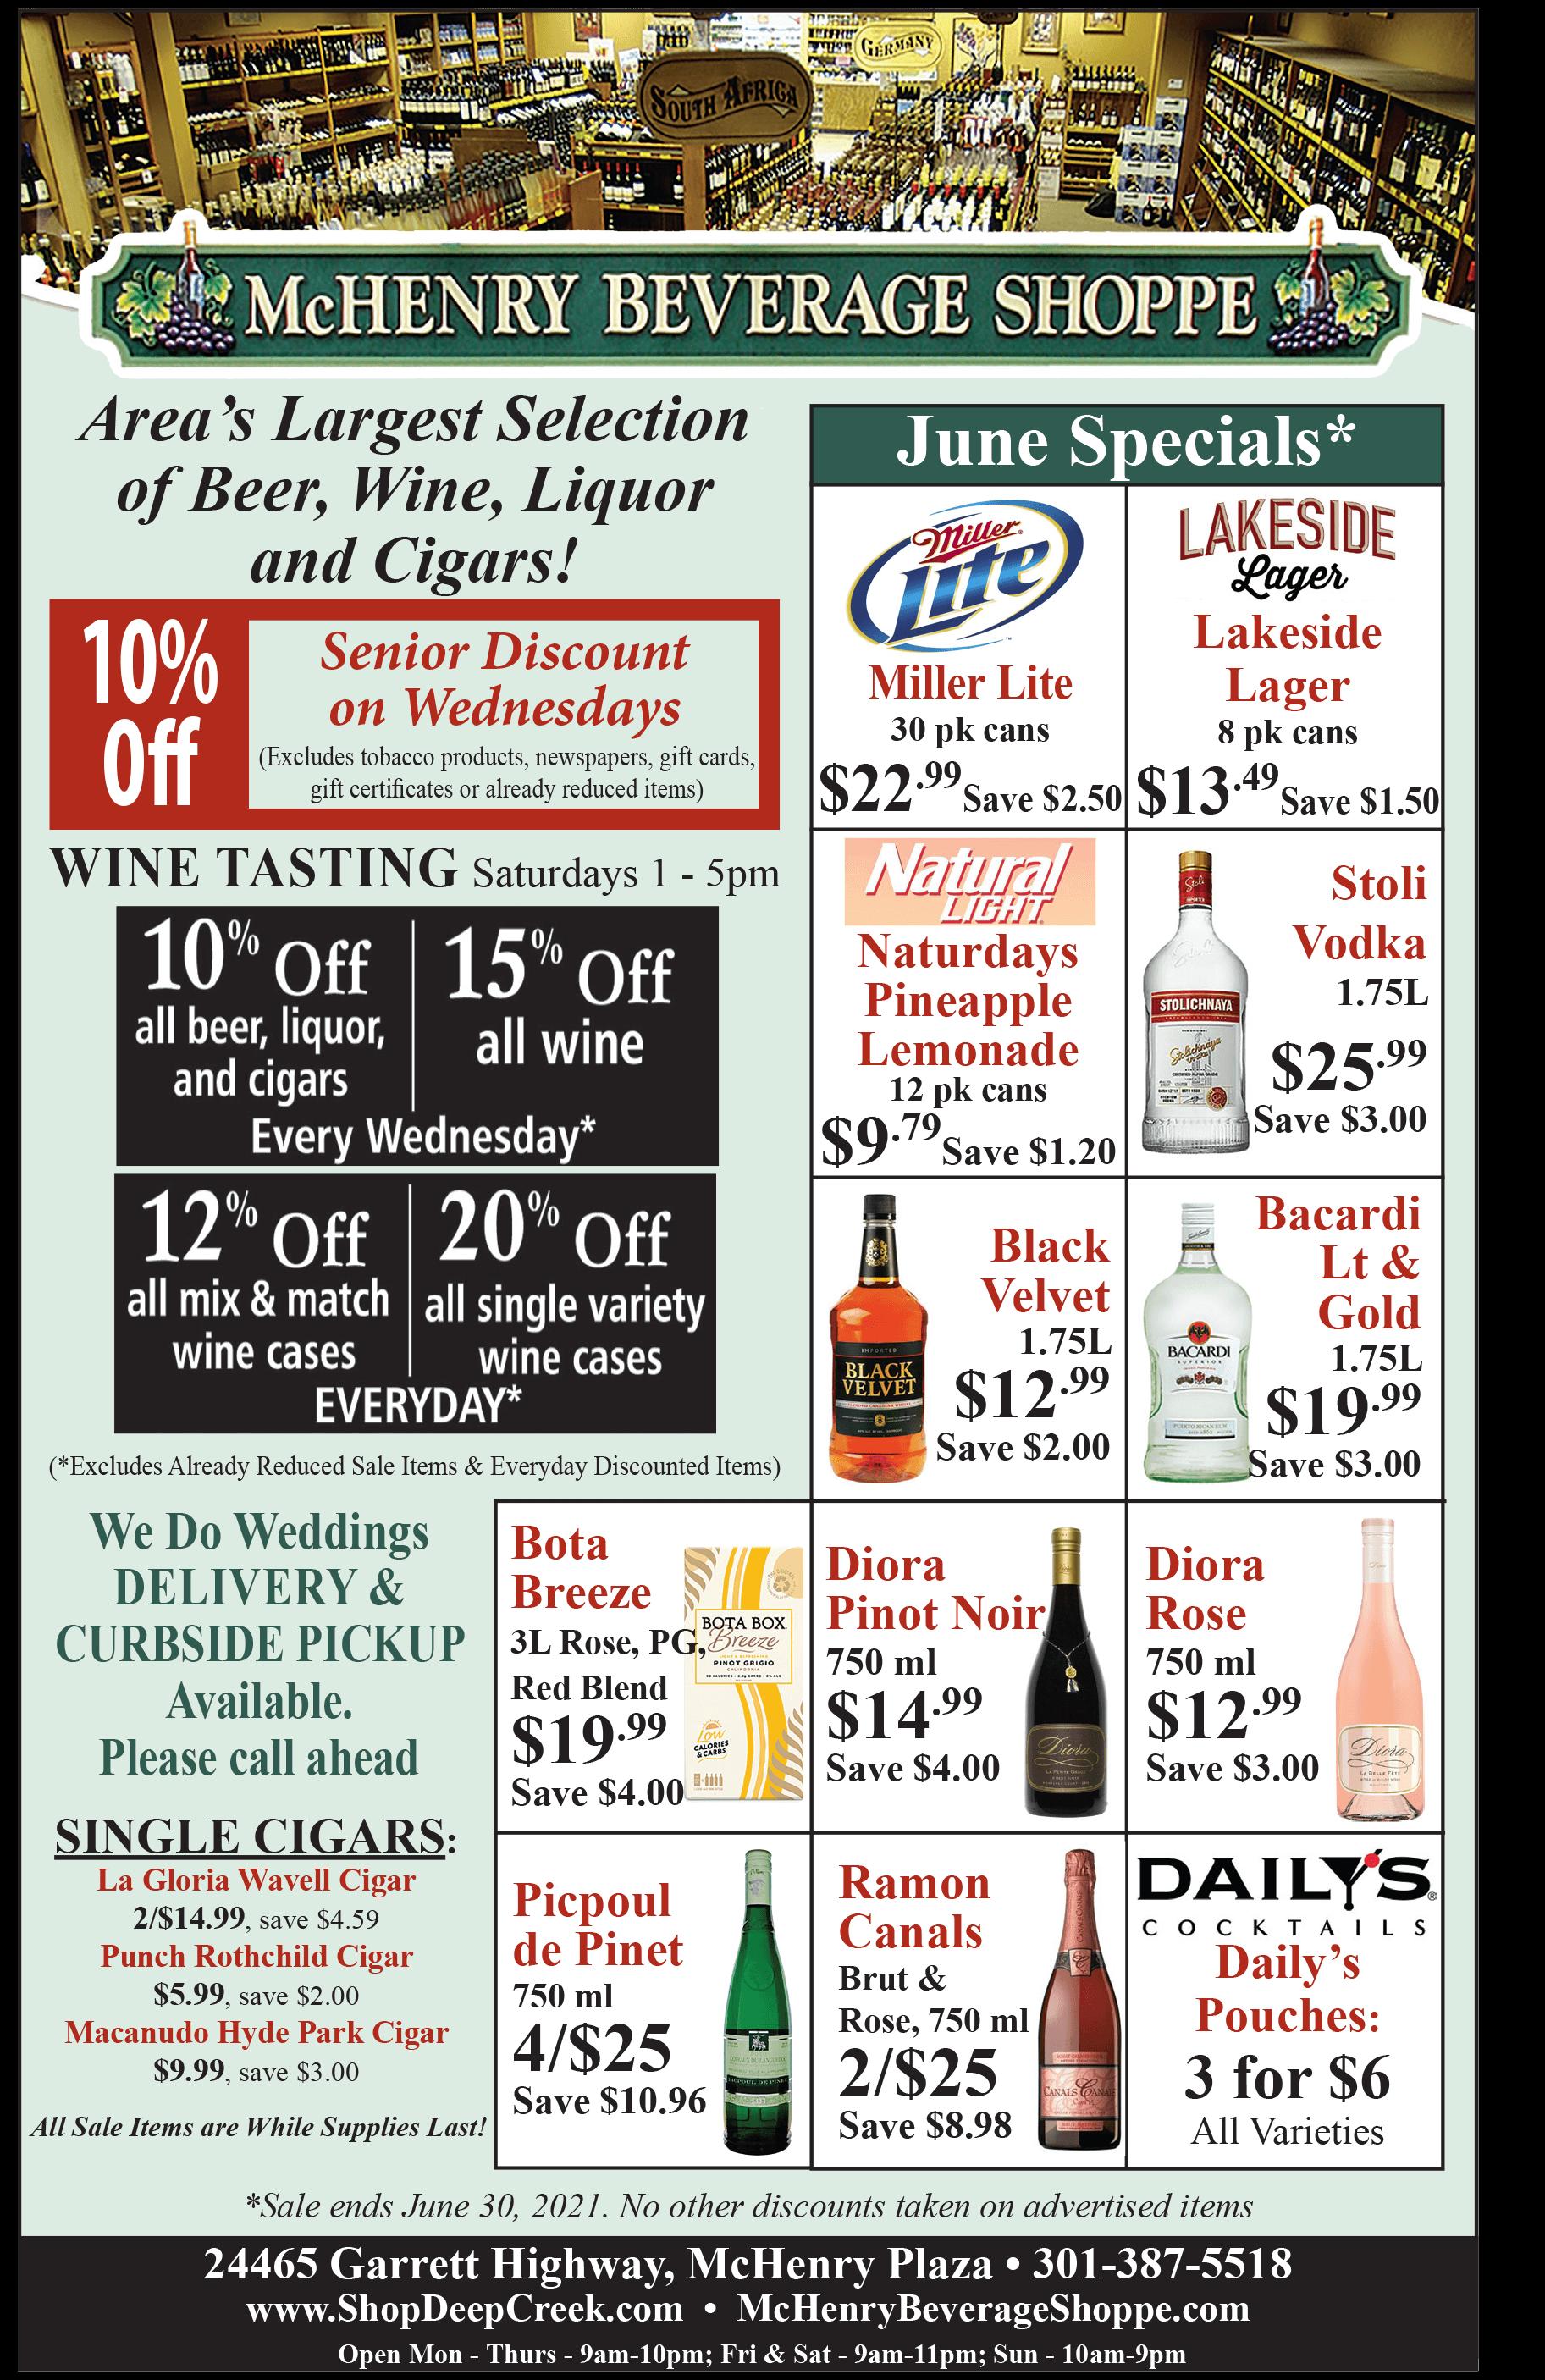 McHenry Beverage Shoppe - April 2021